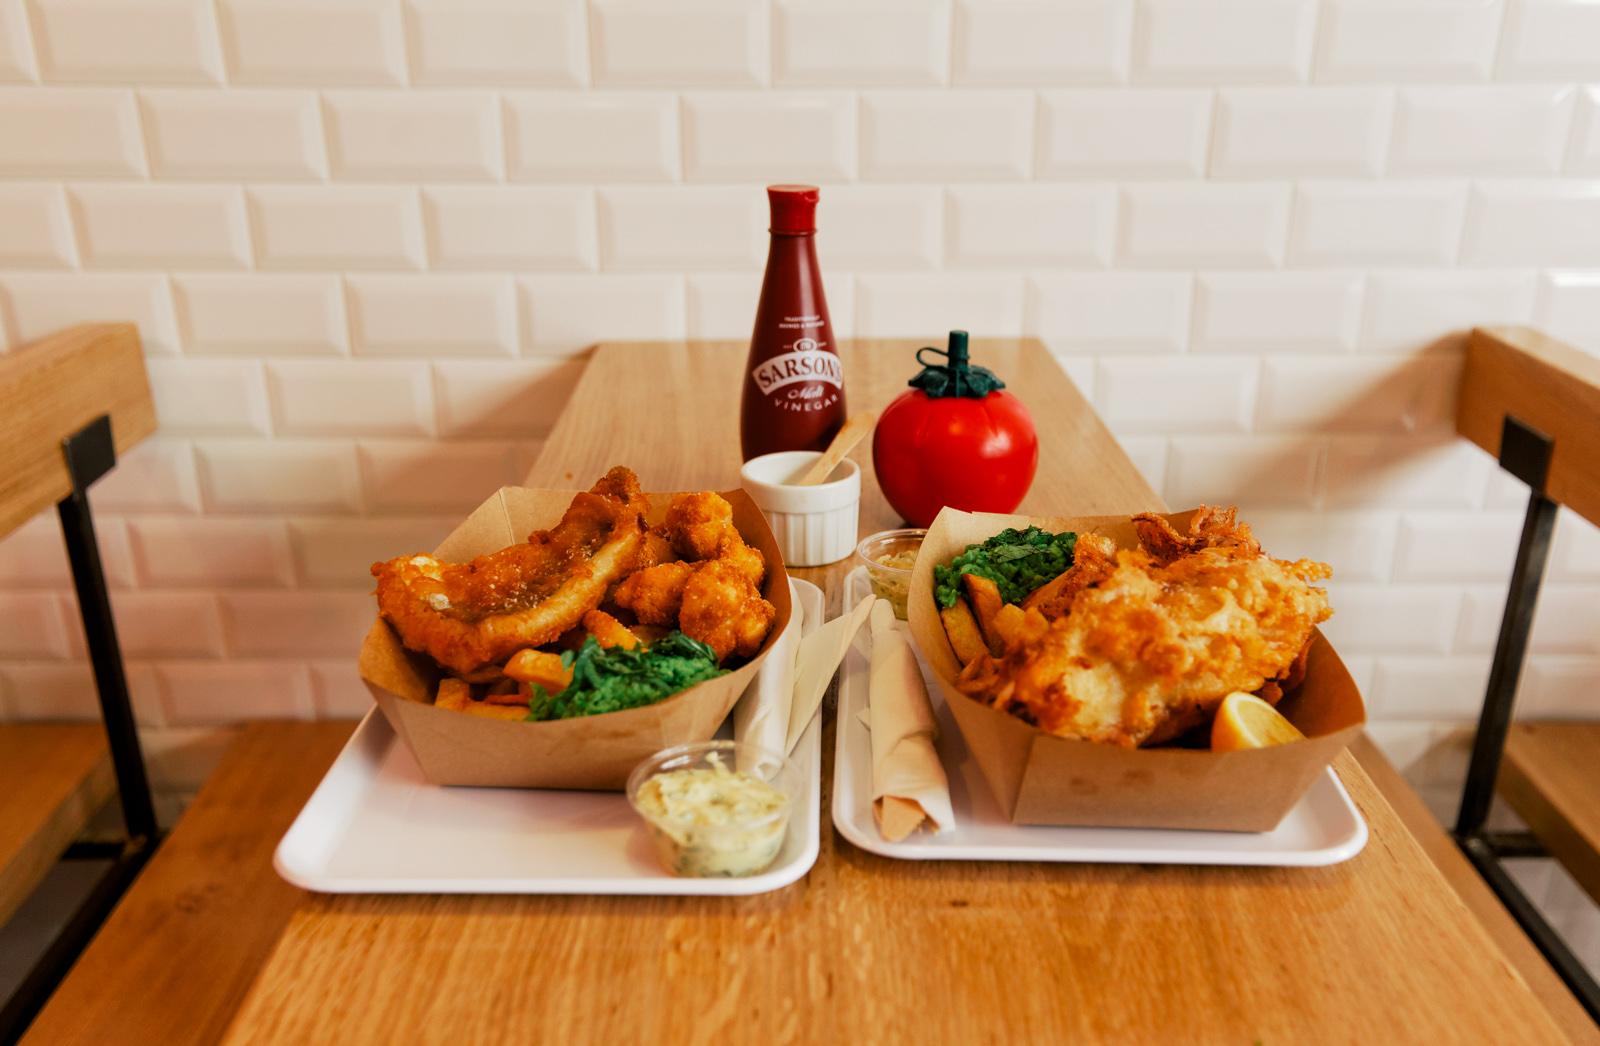 The Sunken Chip_fish&chips